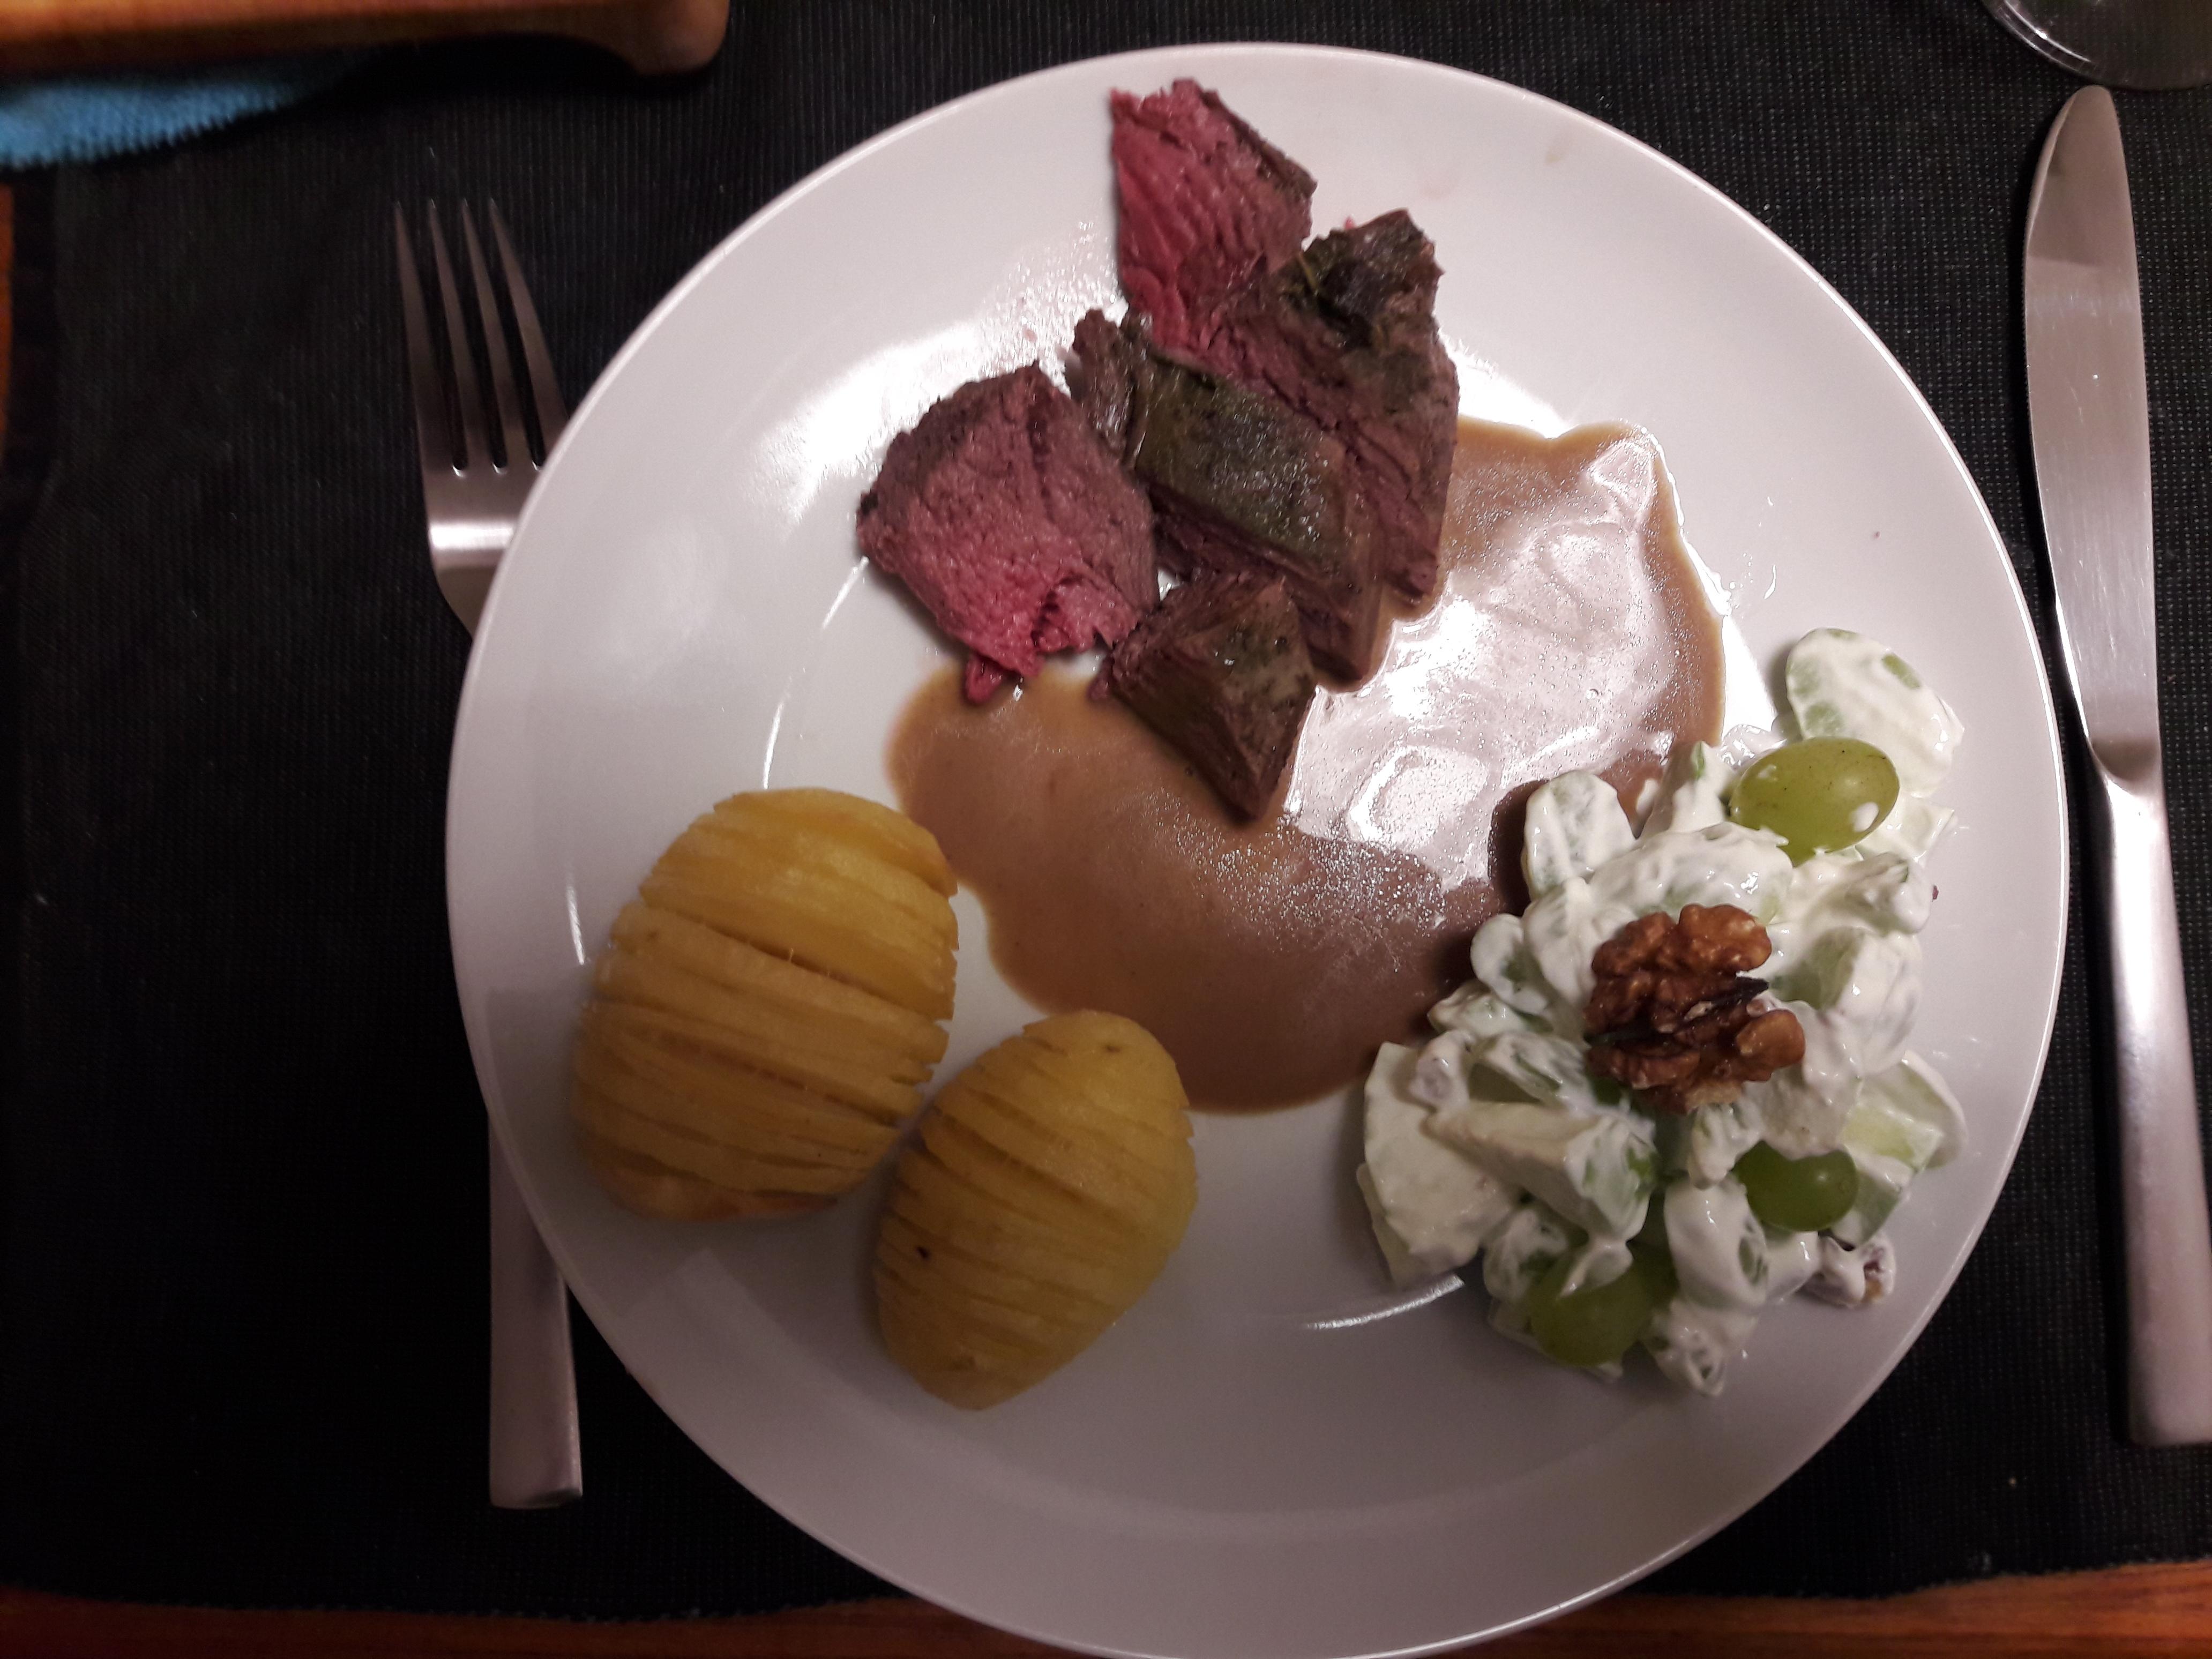 Dyreryg med hasselback kartofler og waldorfsalat.